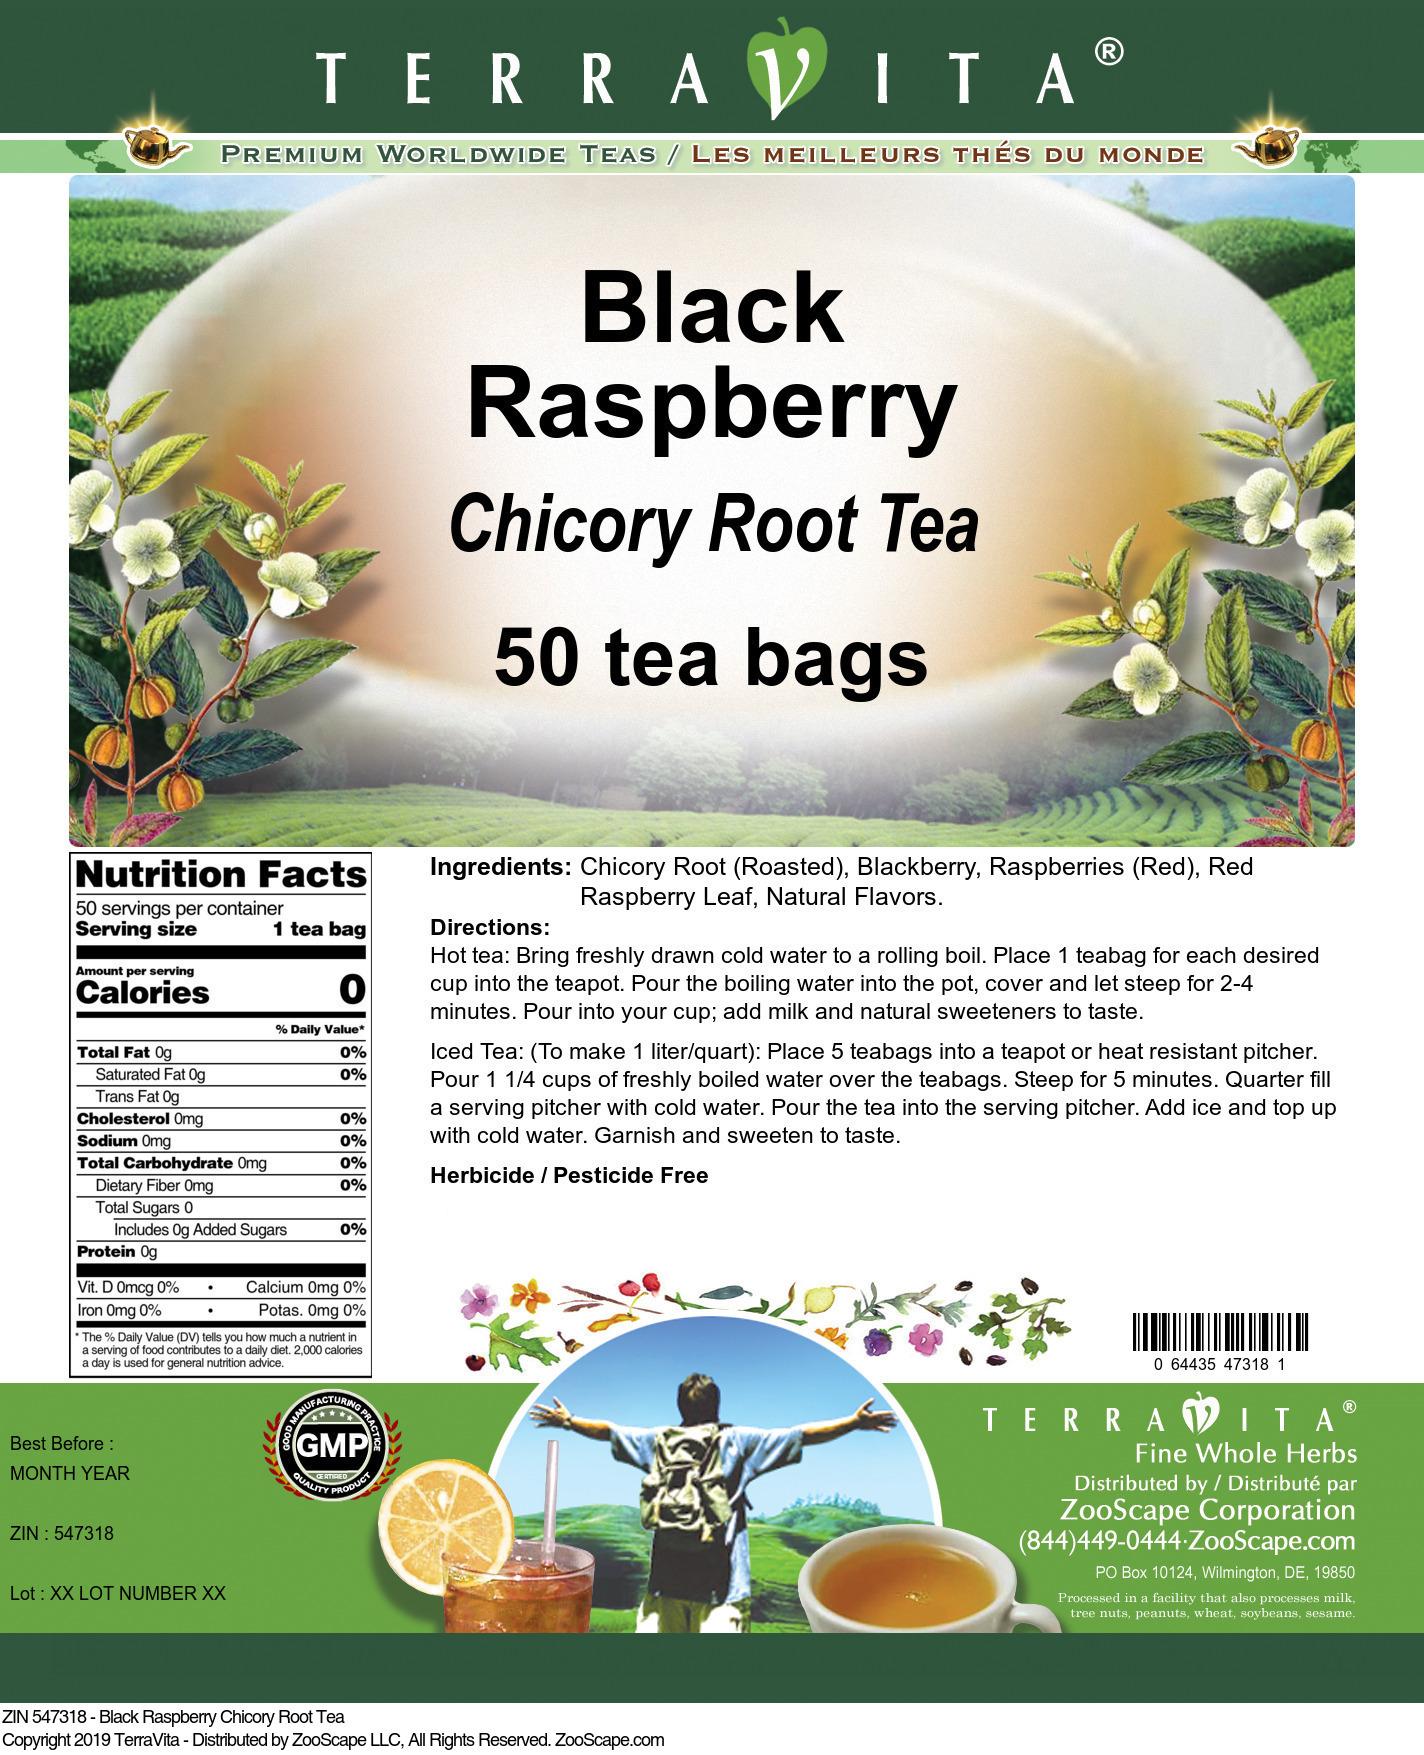 Black Raspberry Chicory Root Tea